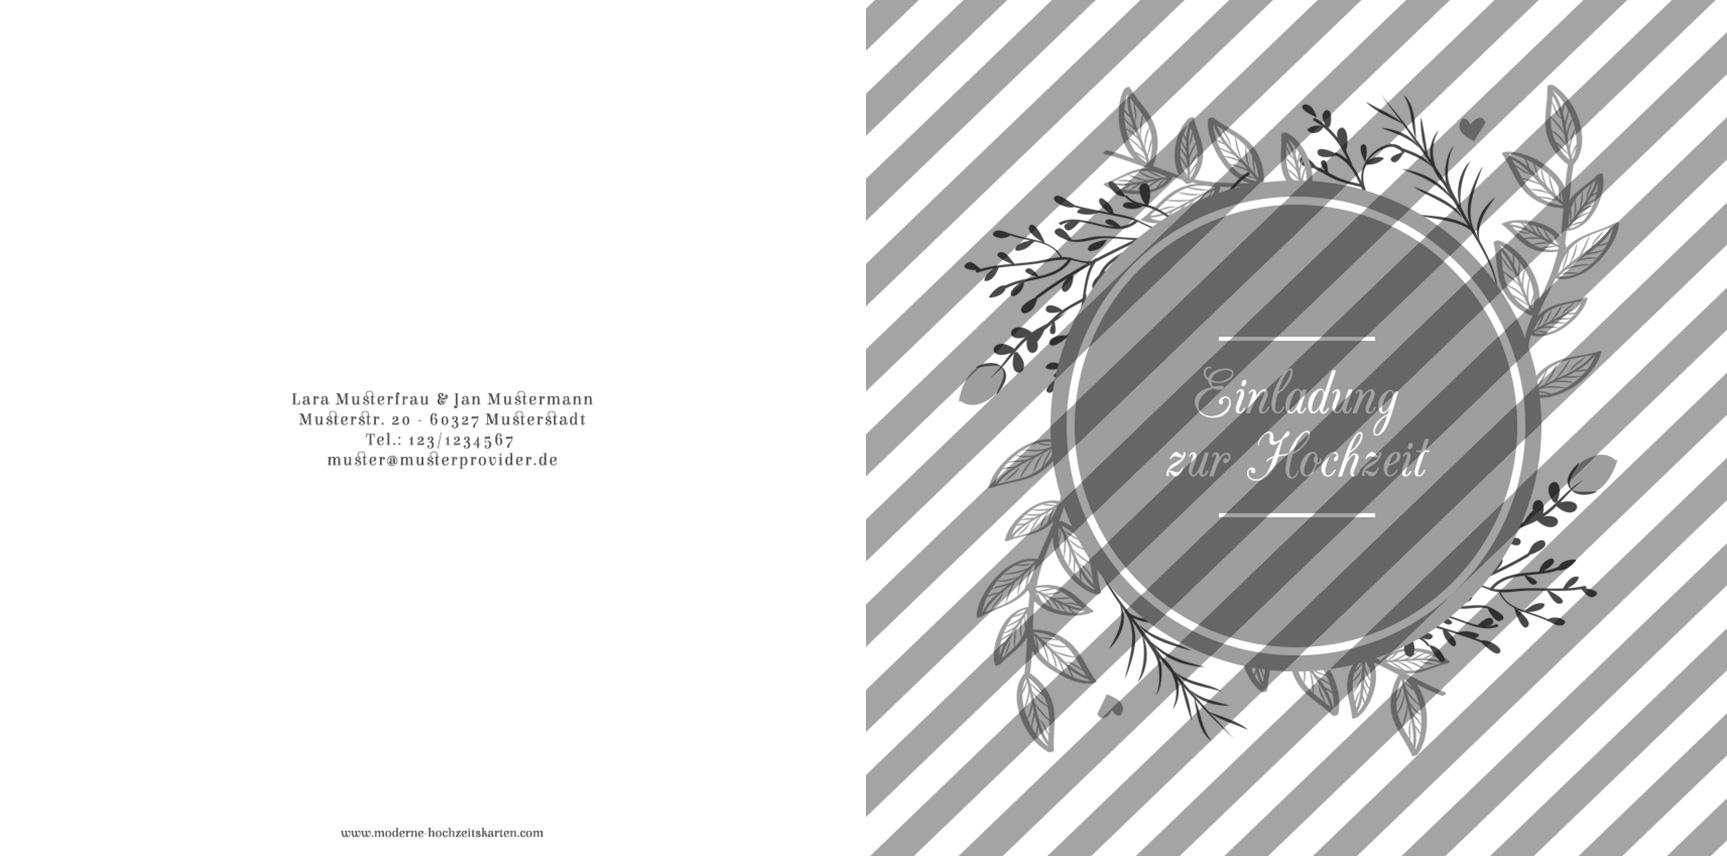 DKQ_editor-alYGzxYc7XNScP9